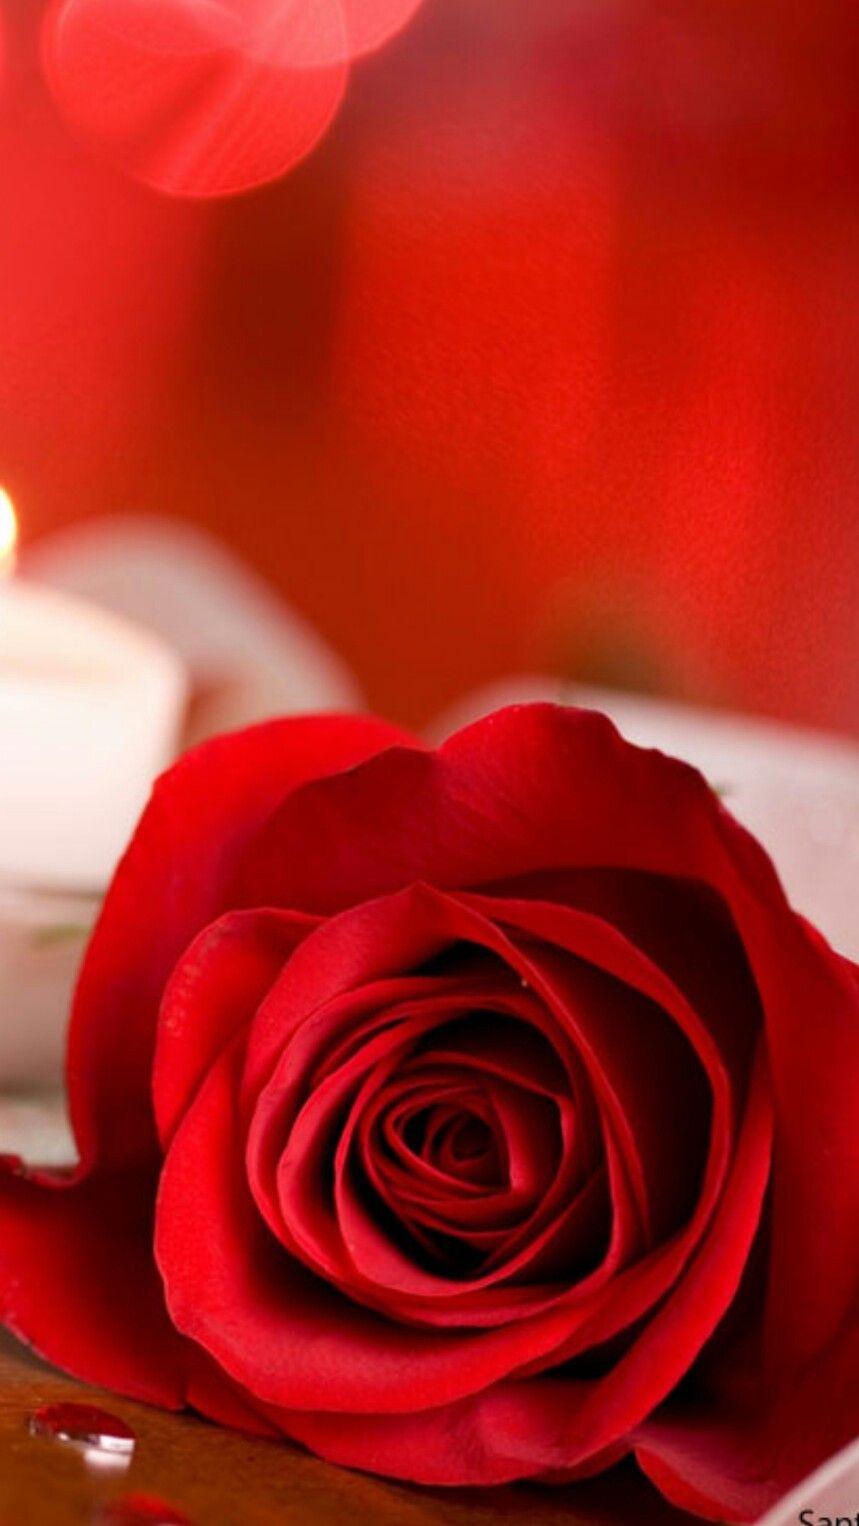 Pin By Sobre Alas De Paloma On Rose Rose Wallpaper Red Roses Love Rose